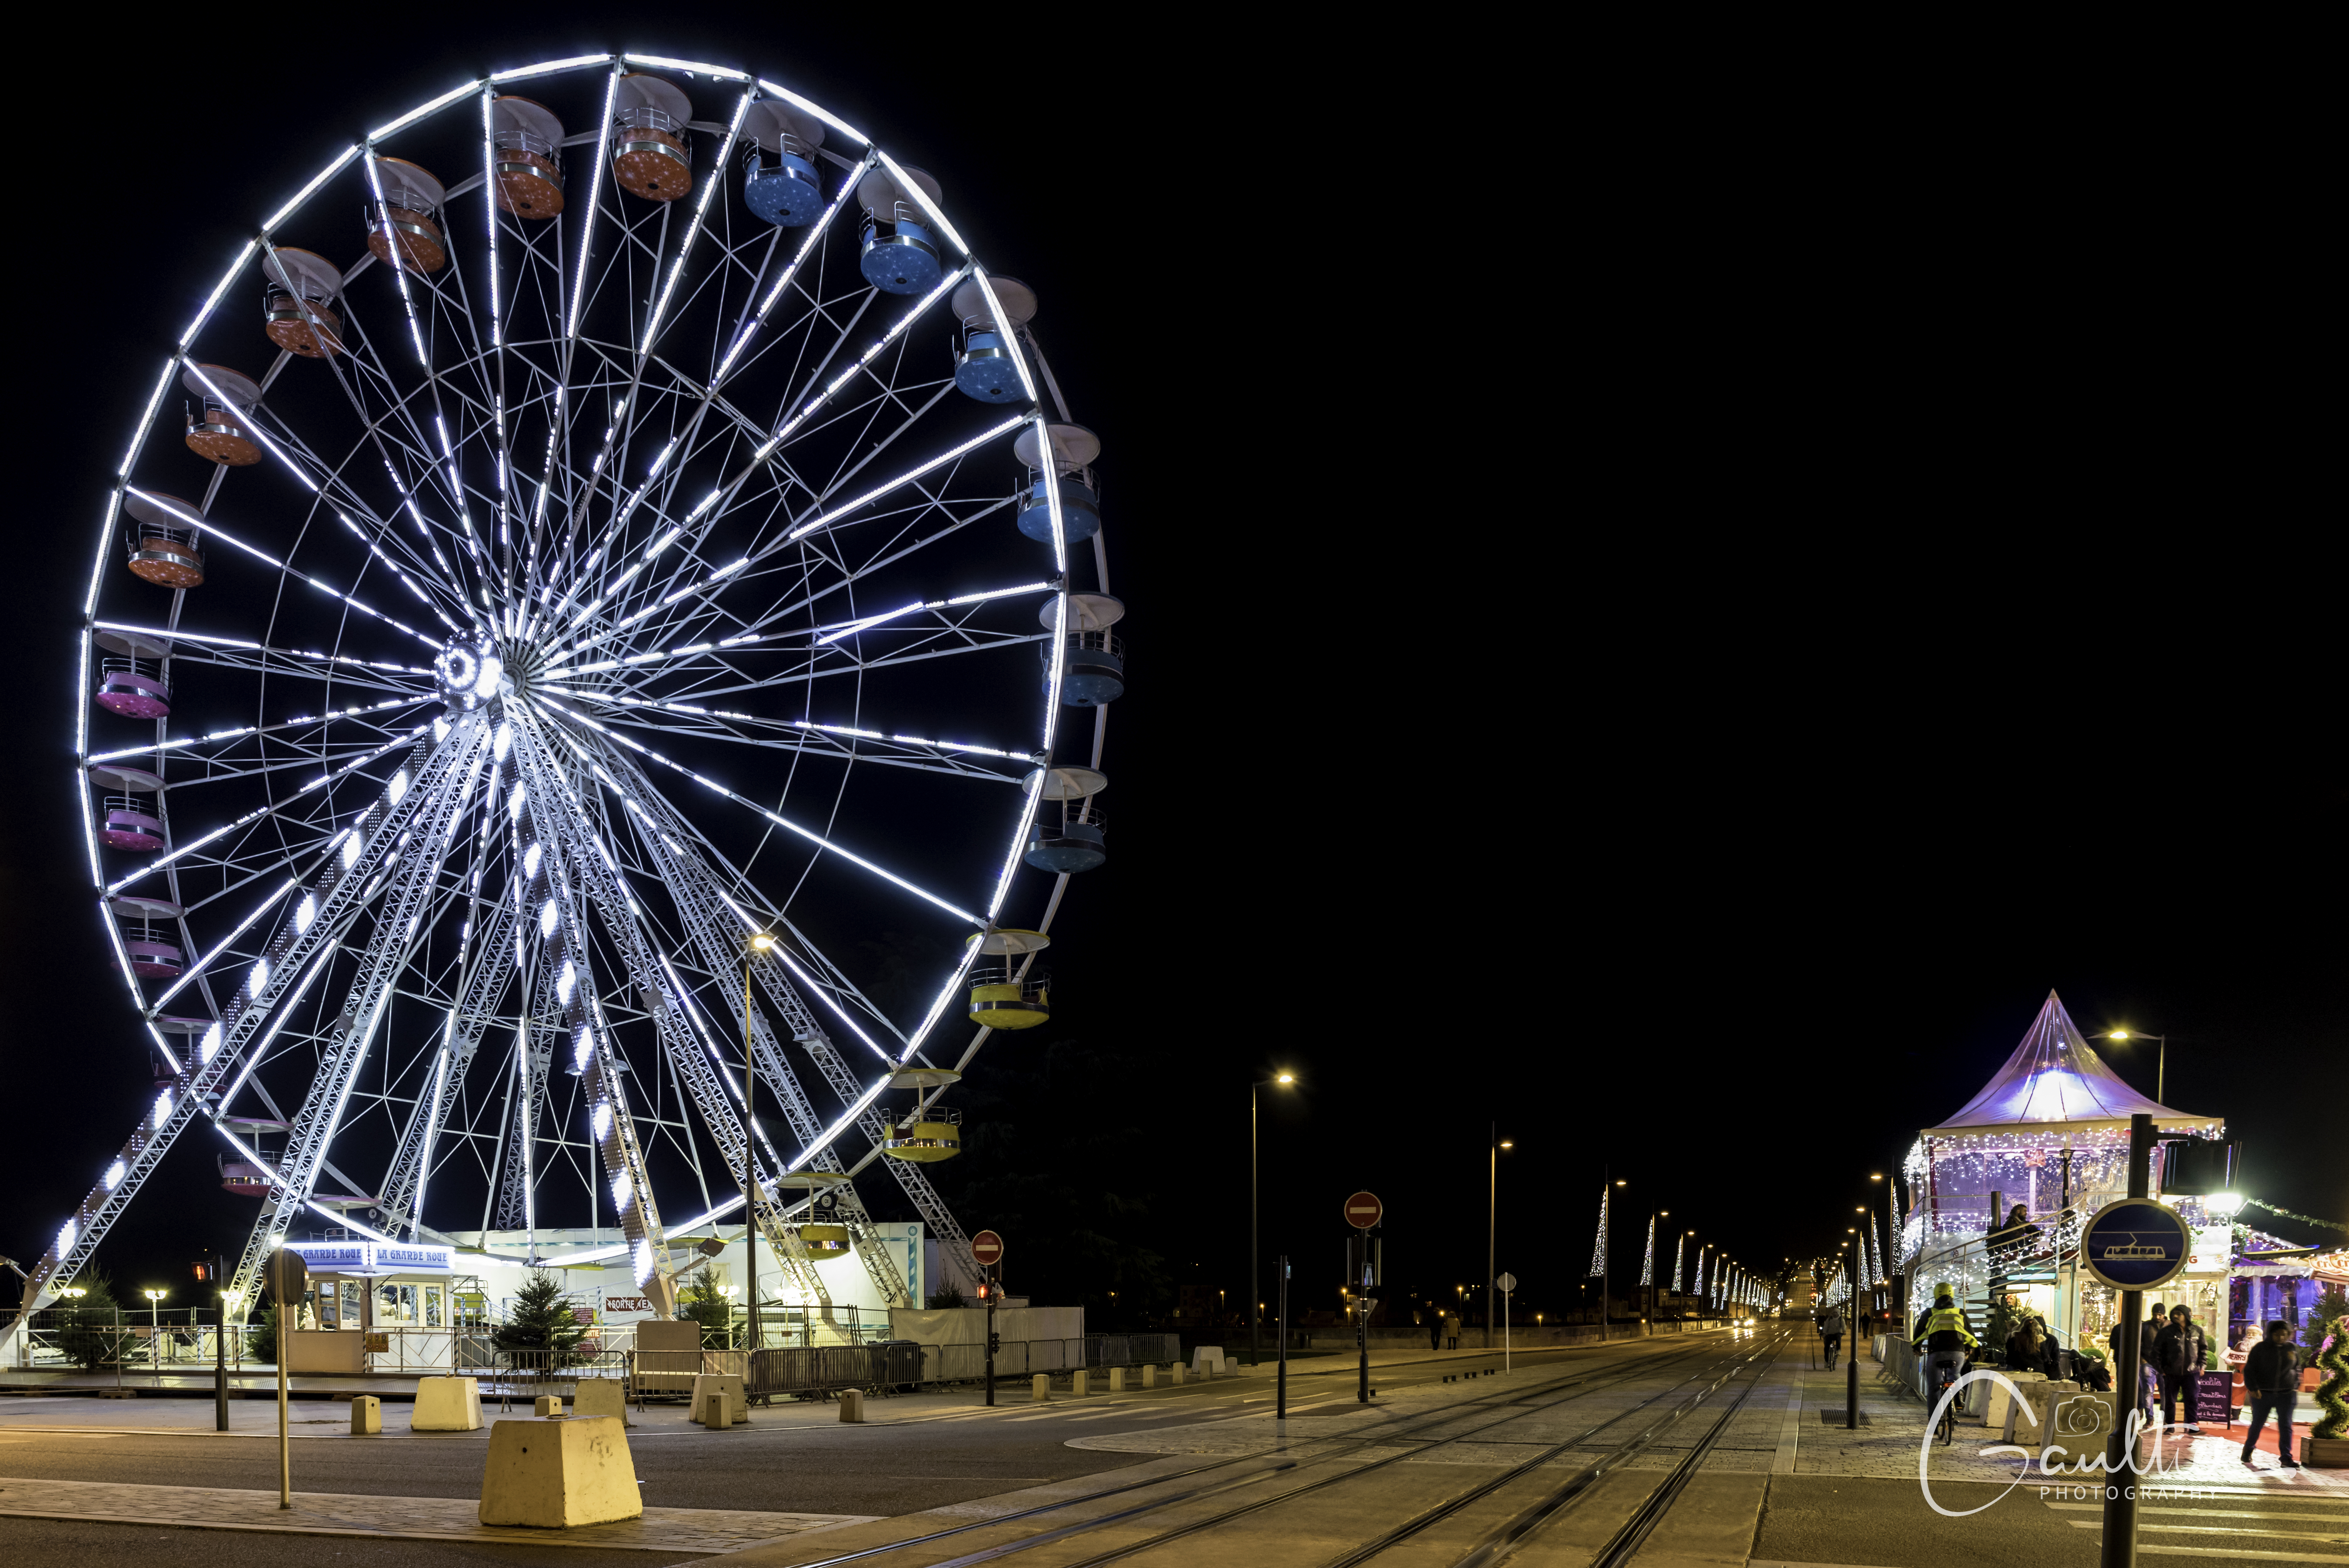 La grande roue, Place Anatole France